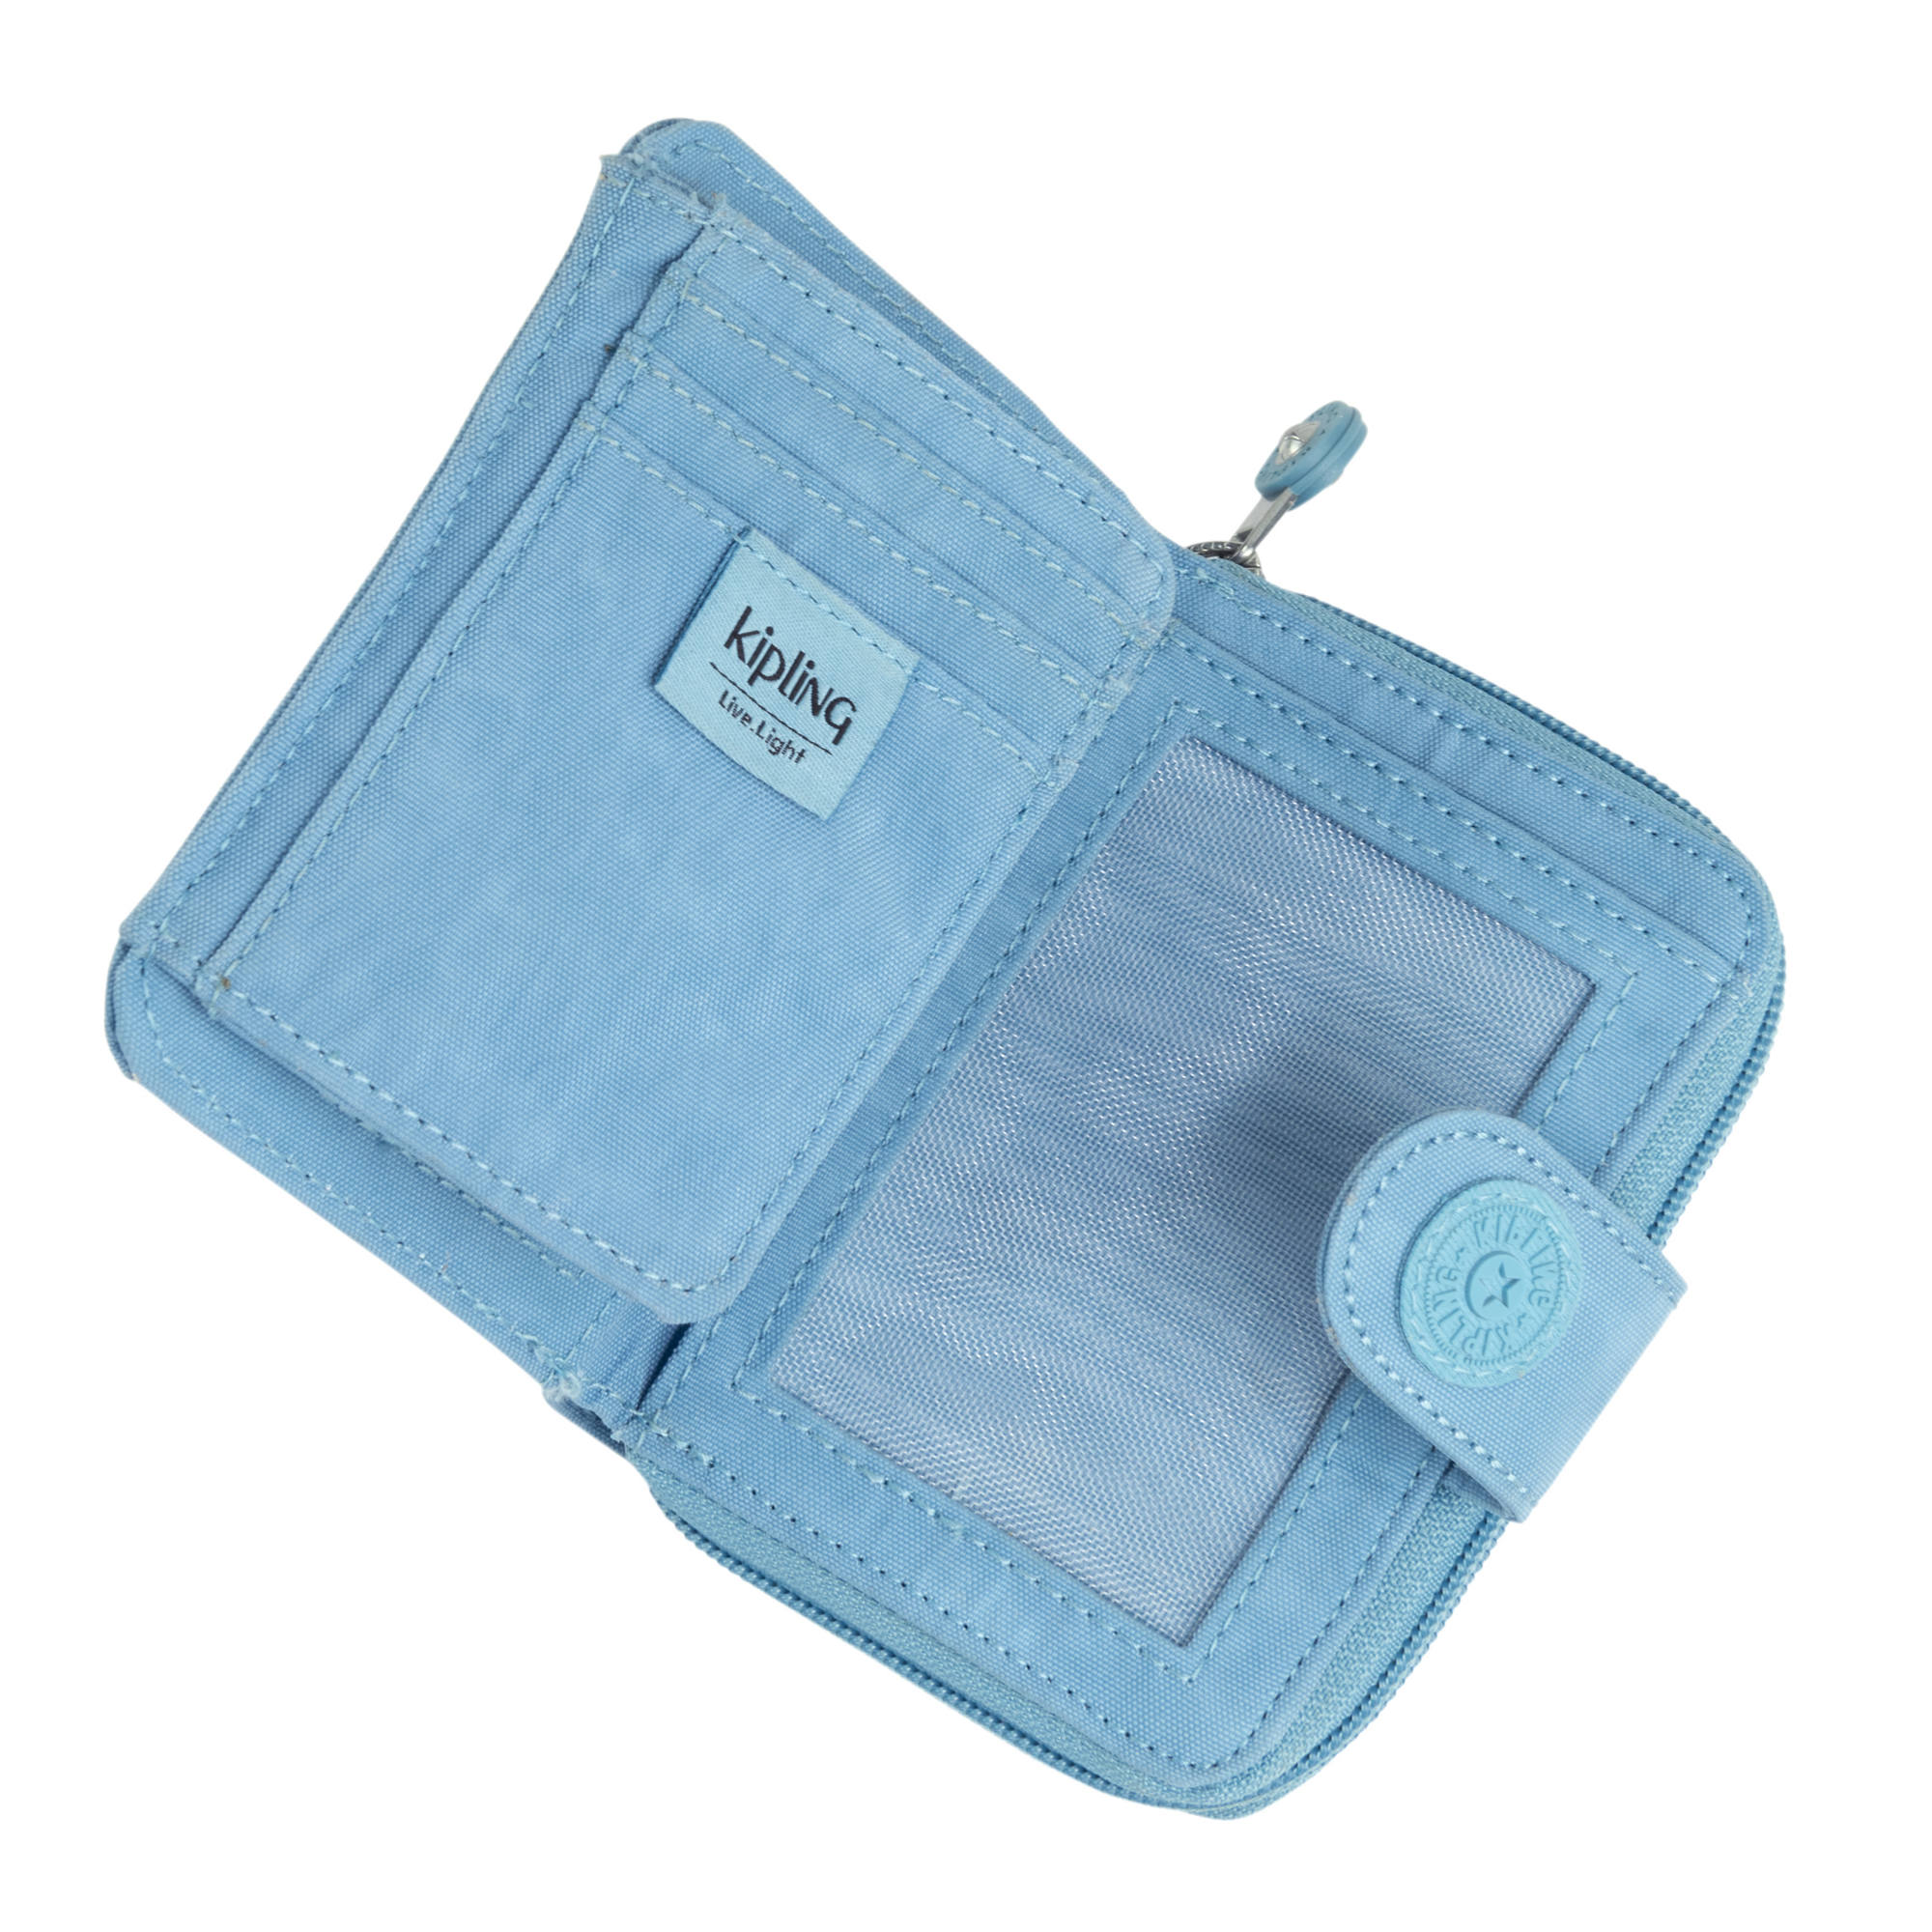 e6a2644b5a6 Kipling-New-Money-Small-Credit-Card-Wallet thumbnail 9